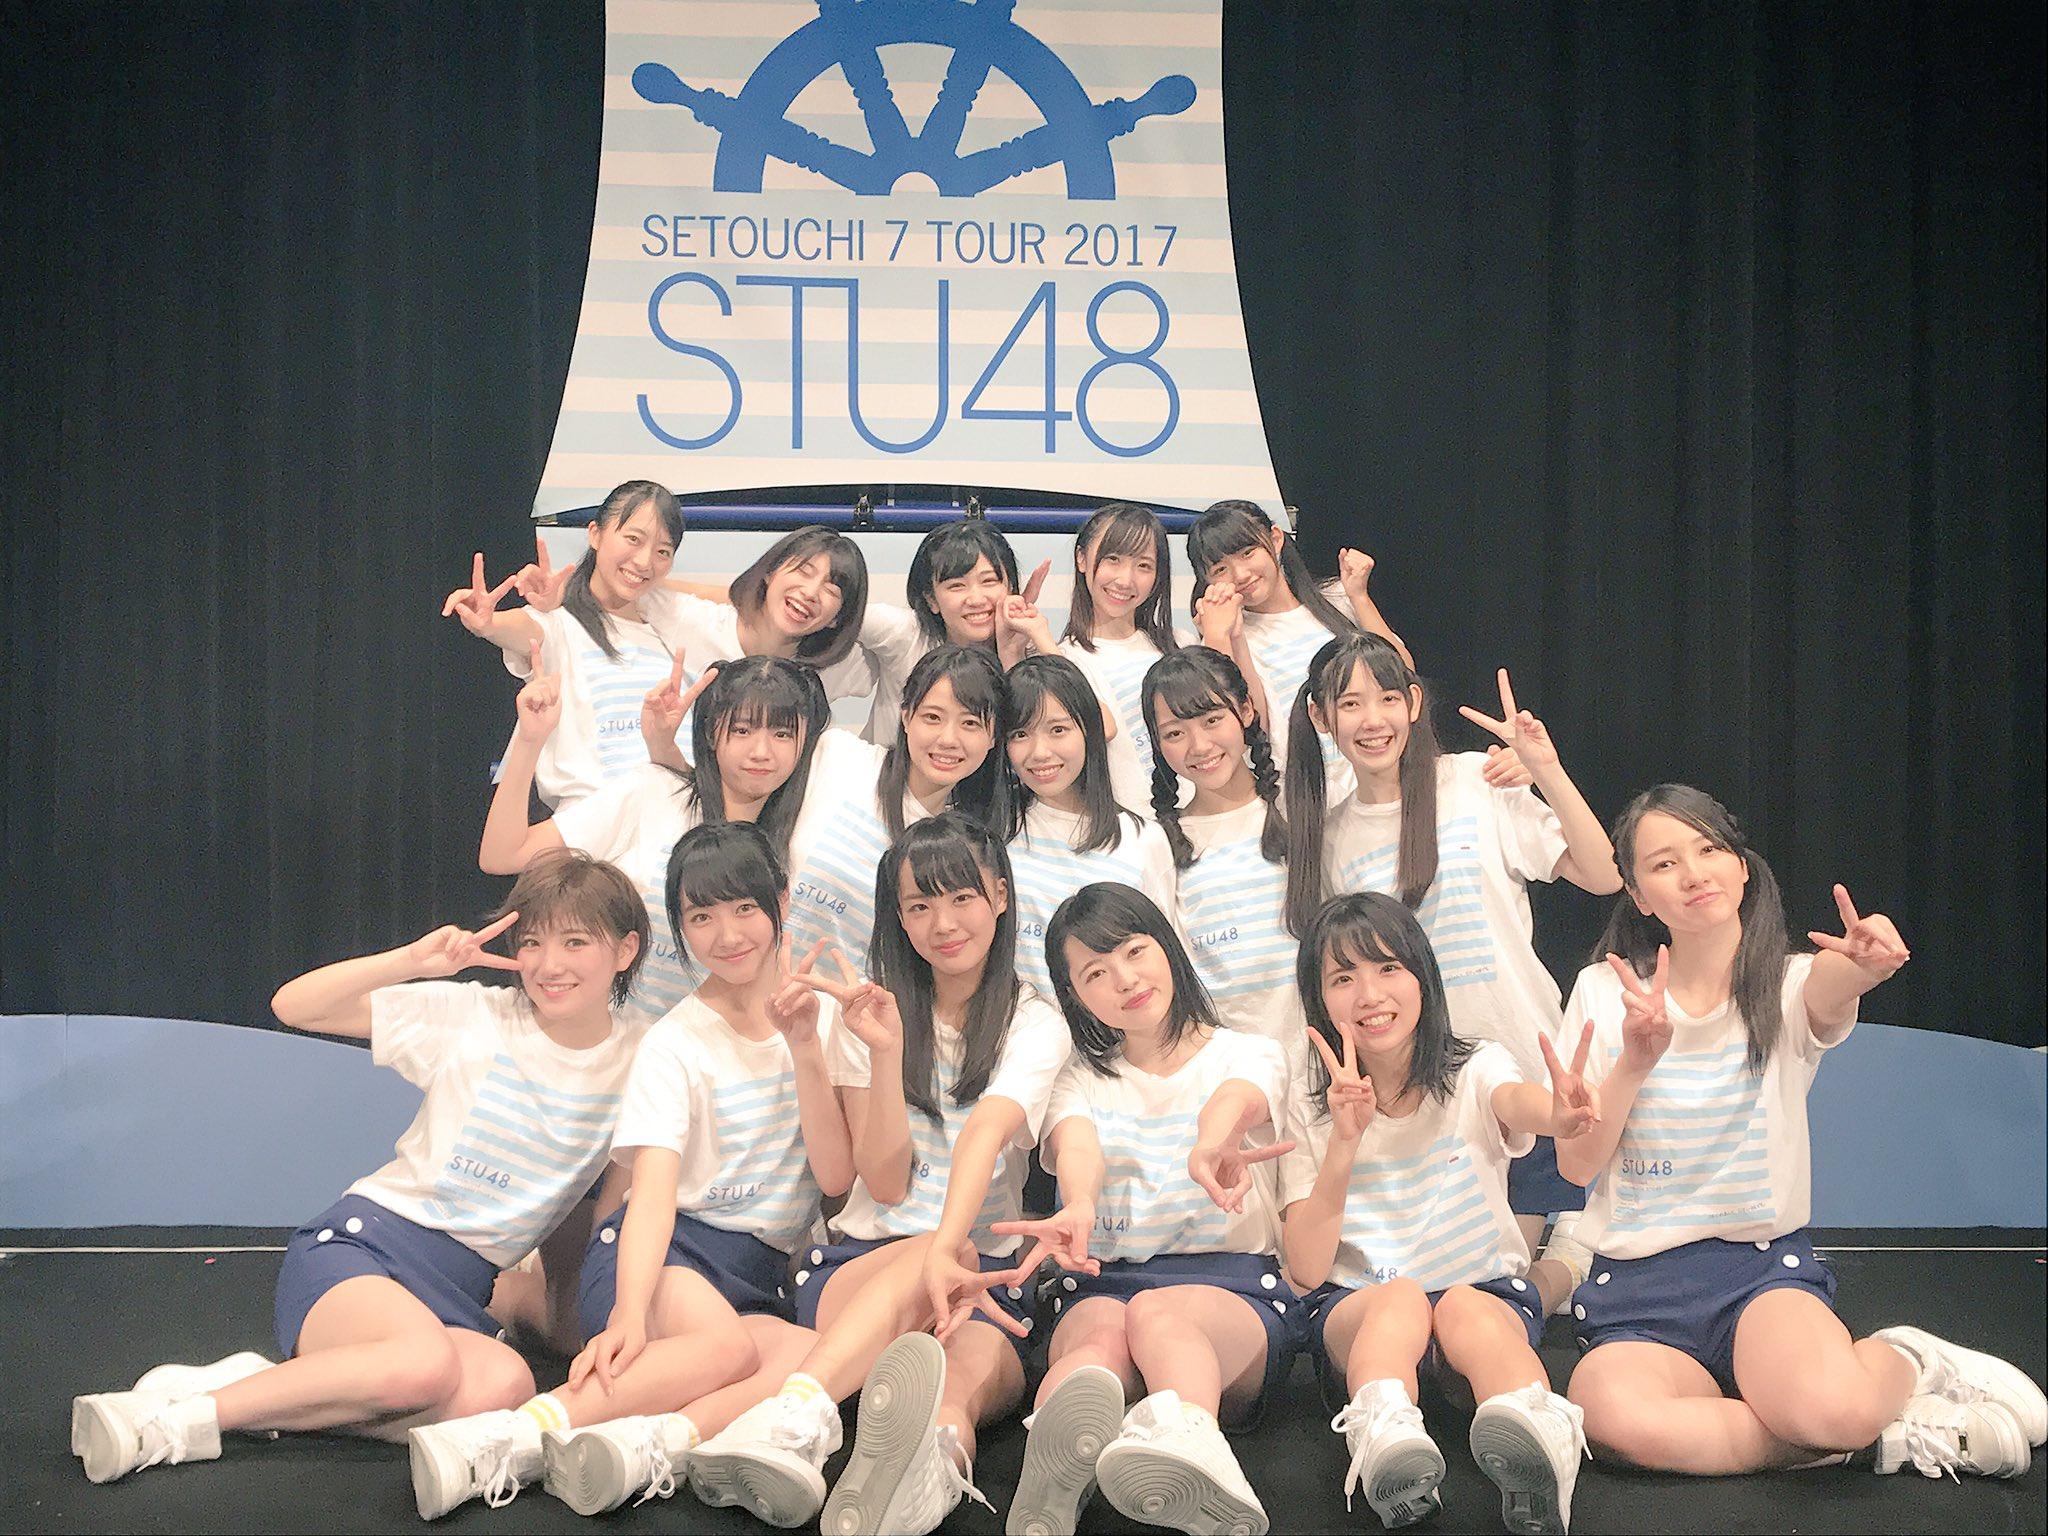 "STU48: STU48 On Twitter: ""#瀬戸内7県ツアー 香川公演ありがとうございました! 次は、11/11に神戸の"